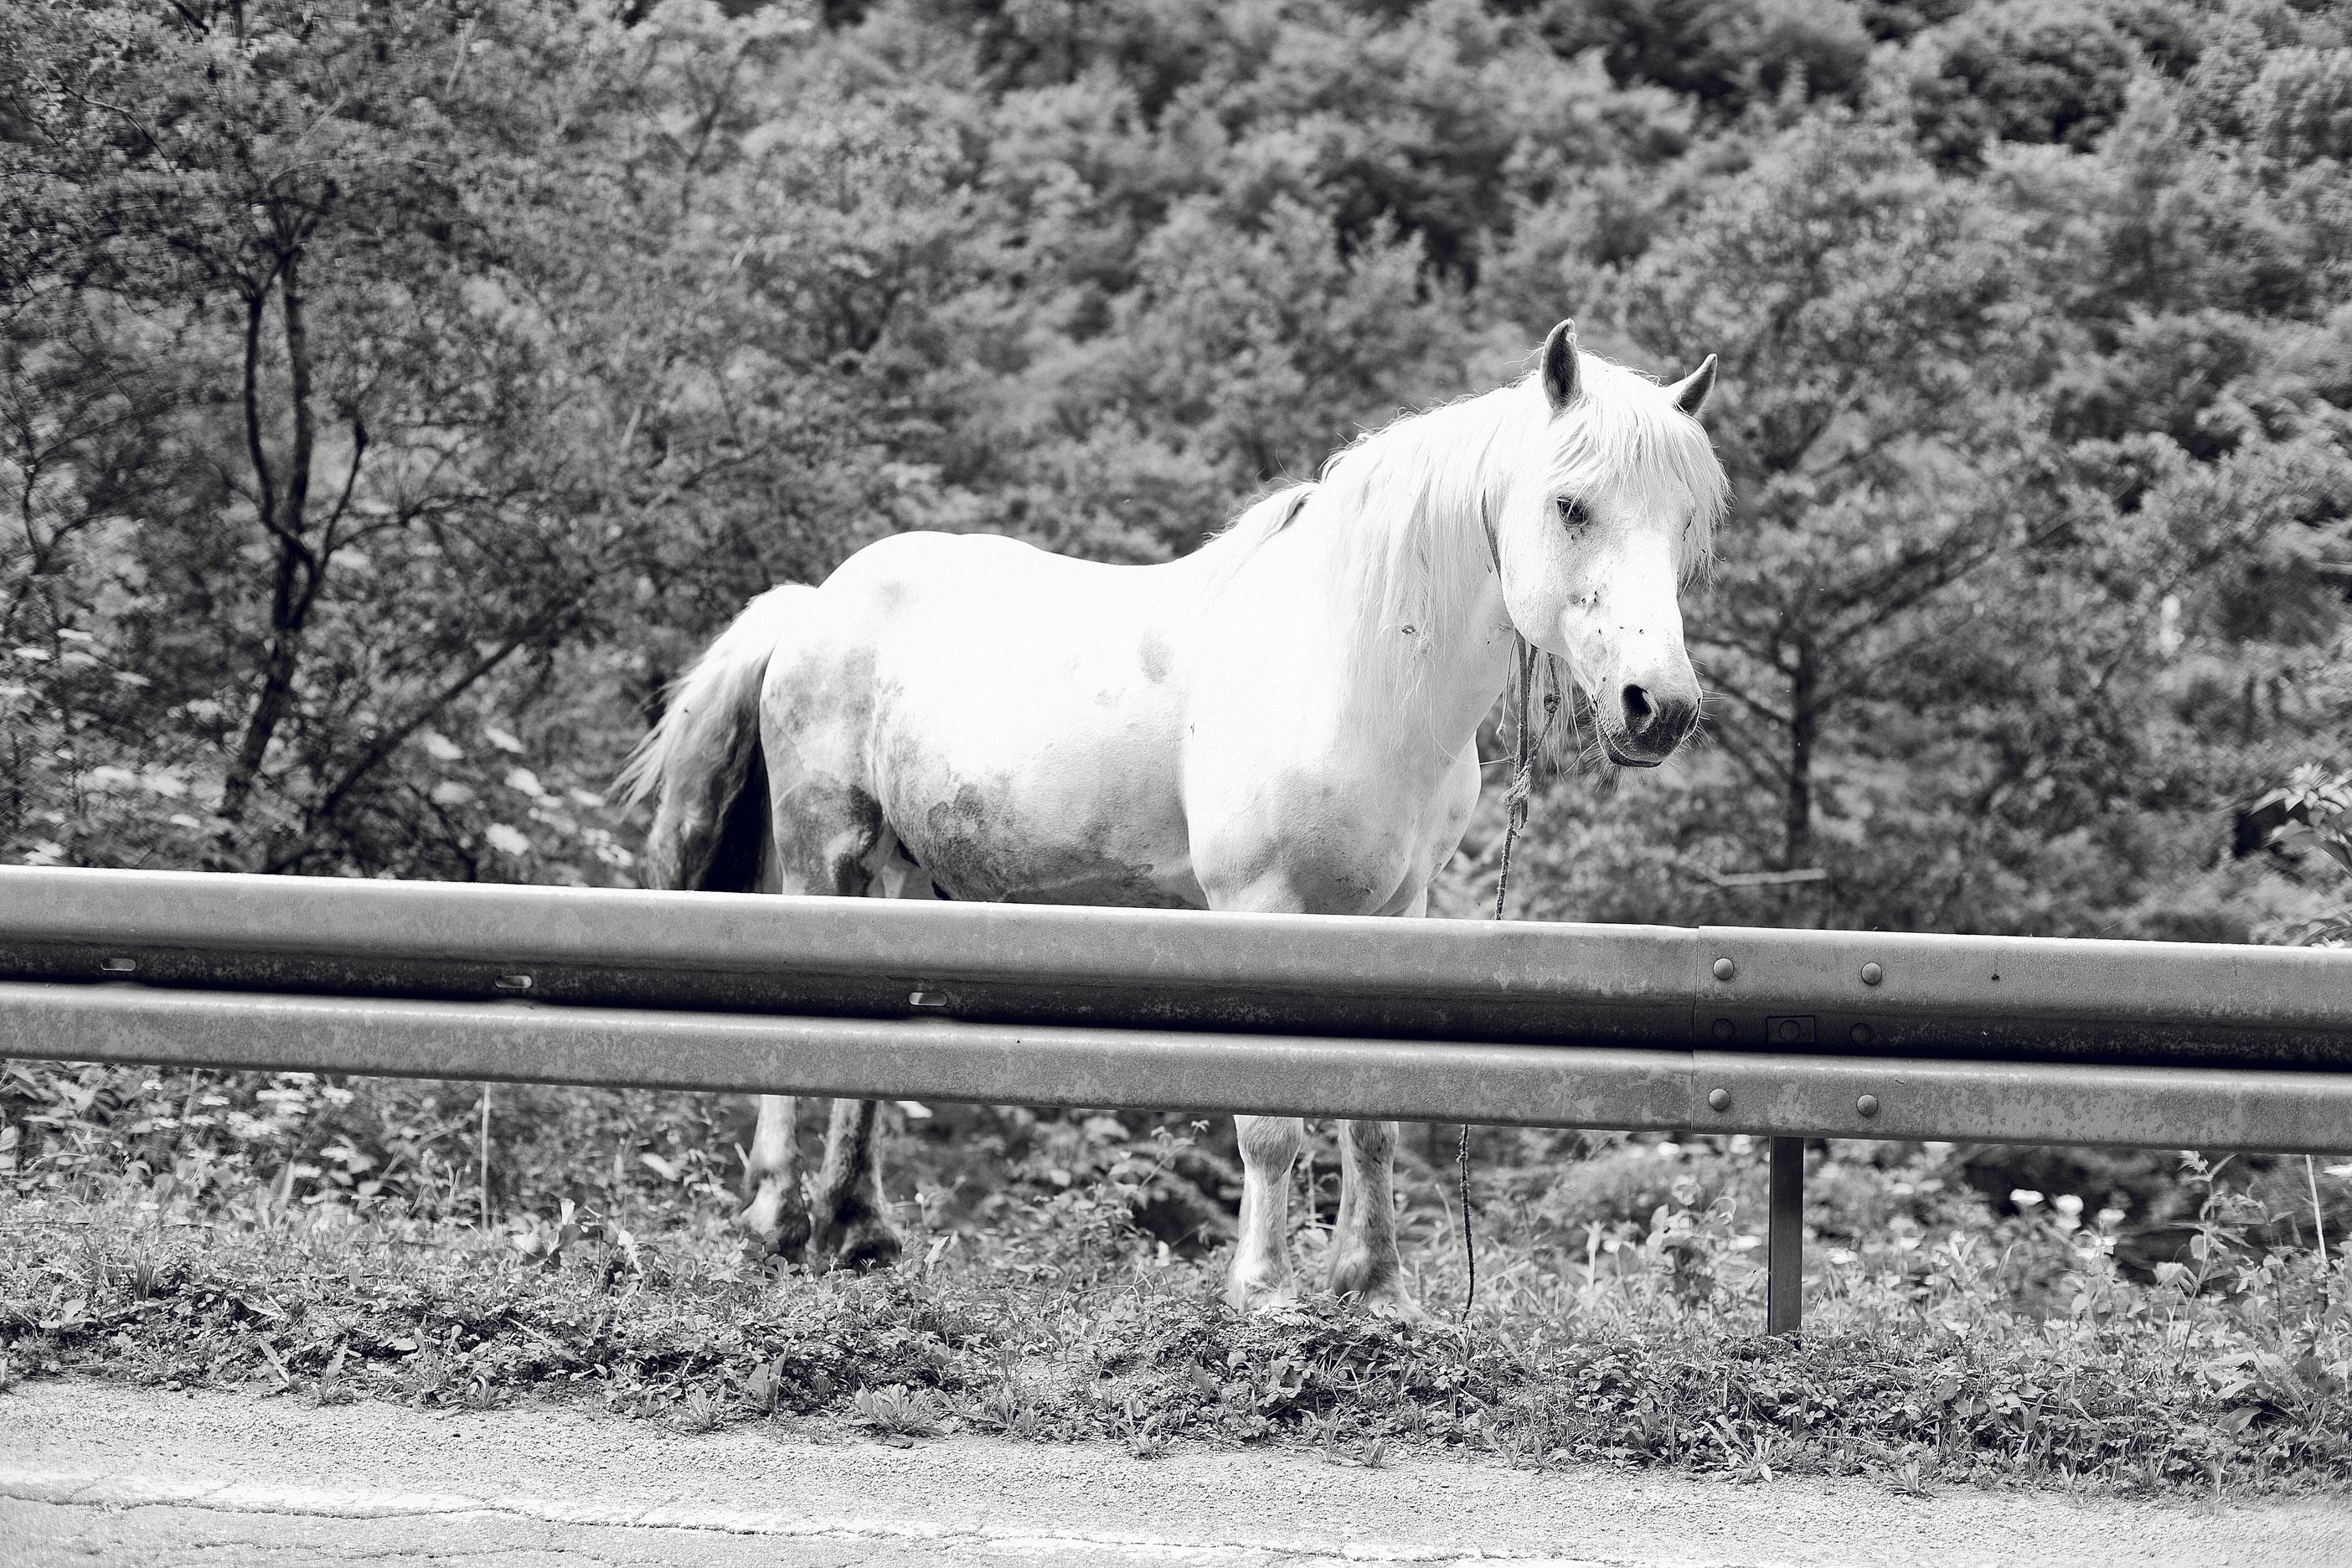 Kultur, Pferd, Einhorn, Marko Mestrovic